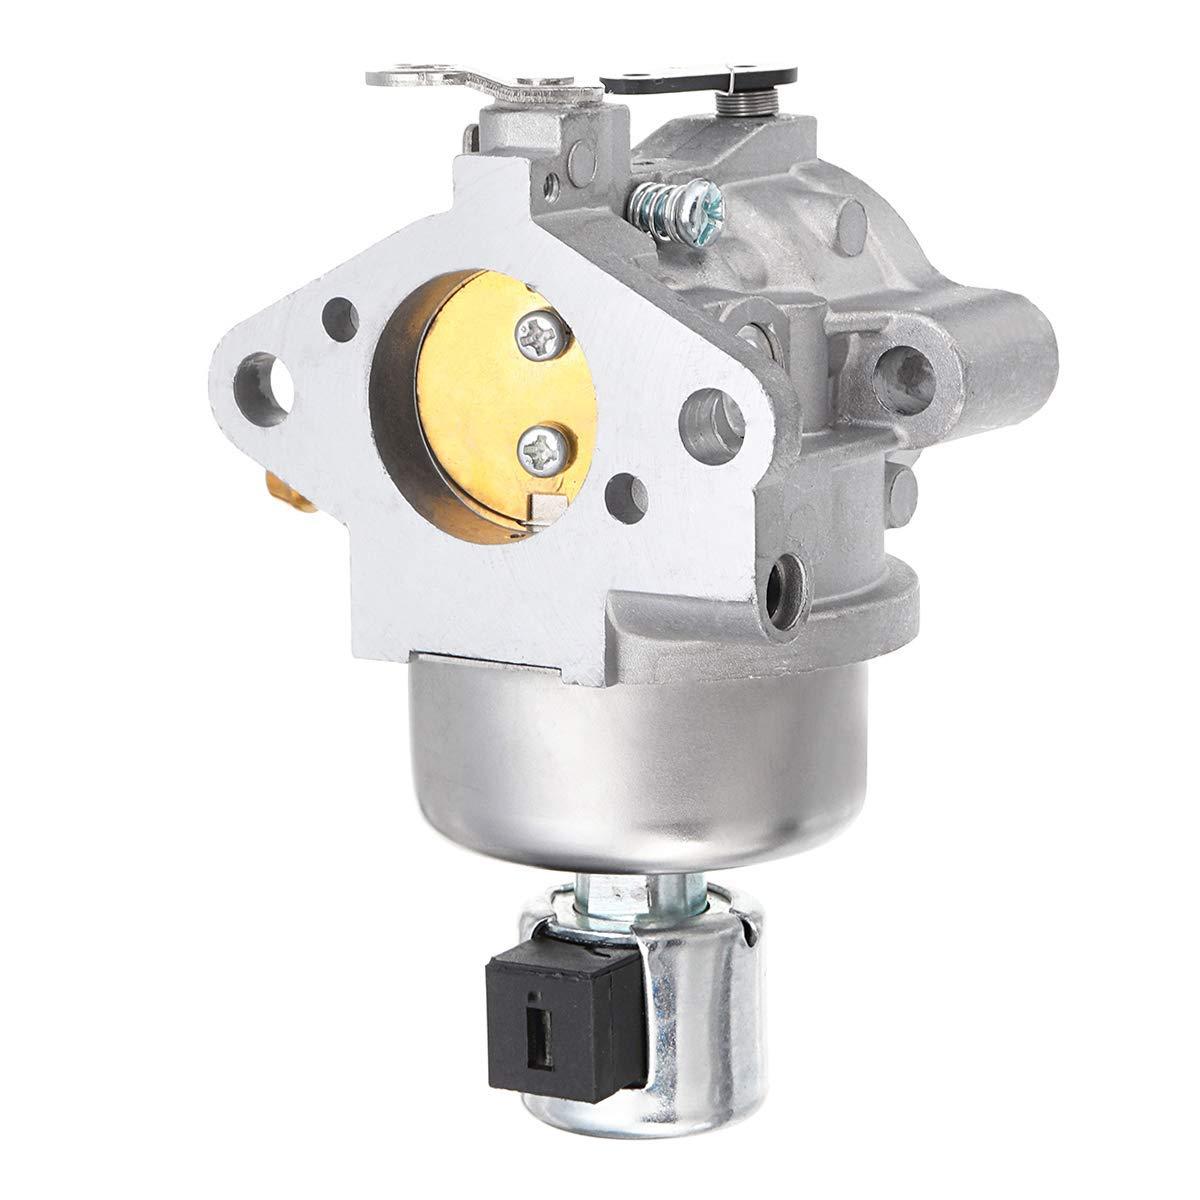 SUCAN Vergaser Kits F/ür Kohler SV530 SV540 SV470 SV480 SV590 SV610 SV620 SV600